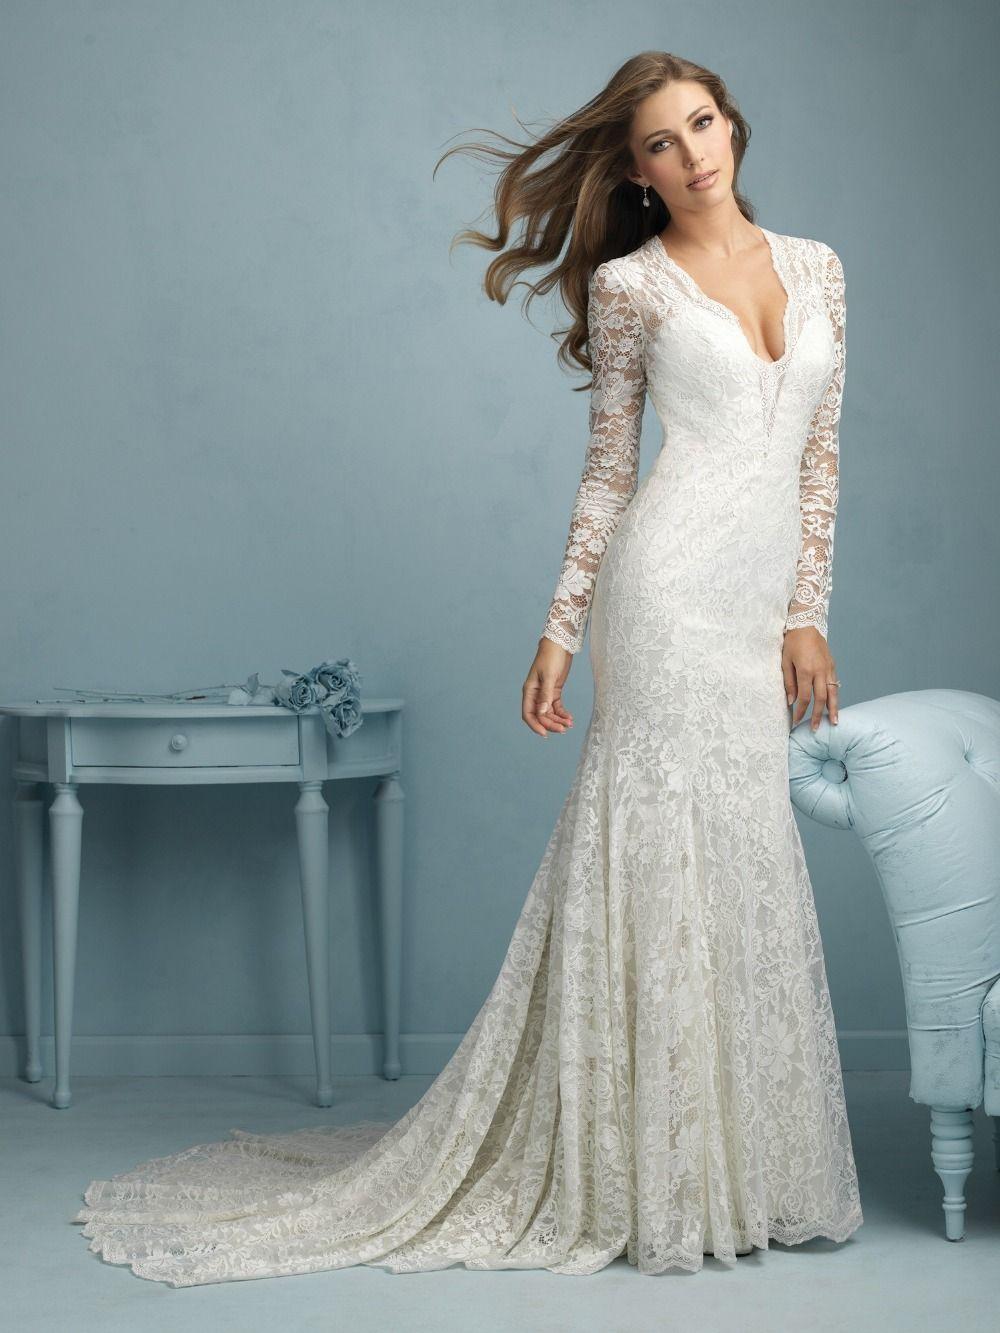 Cheap wedding dresses fast shipping buy quality wedding dress train